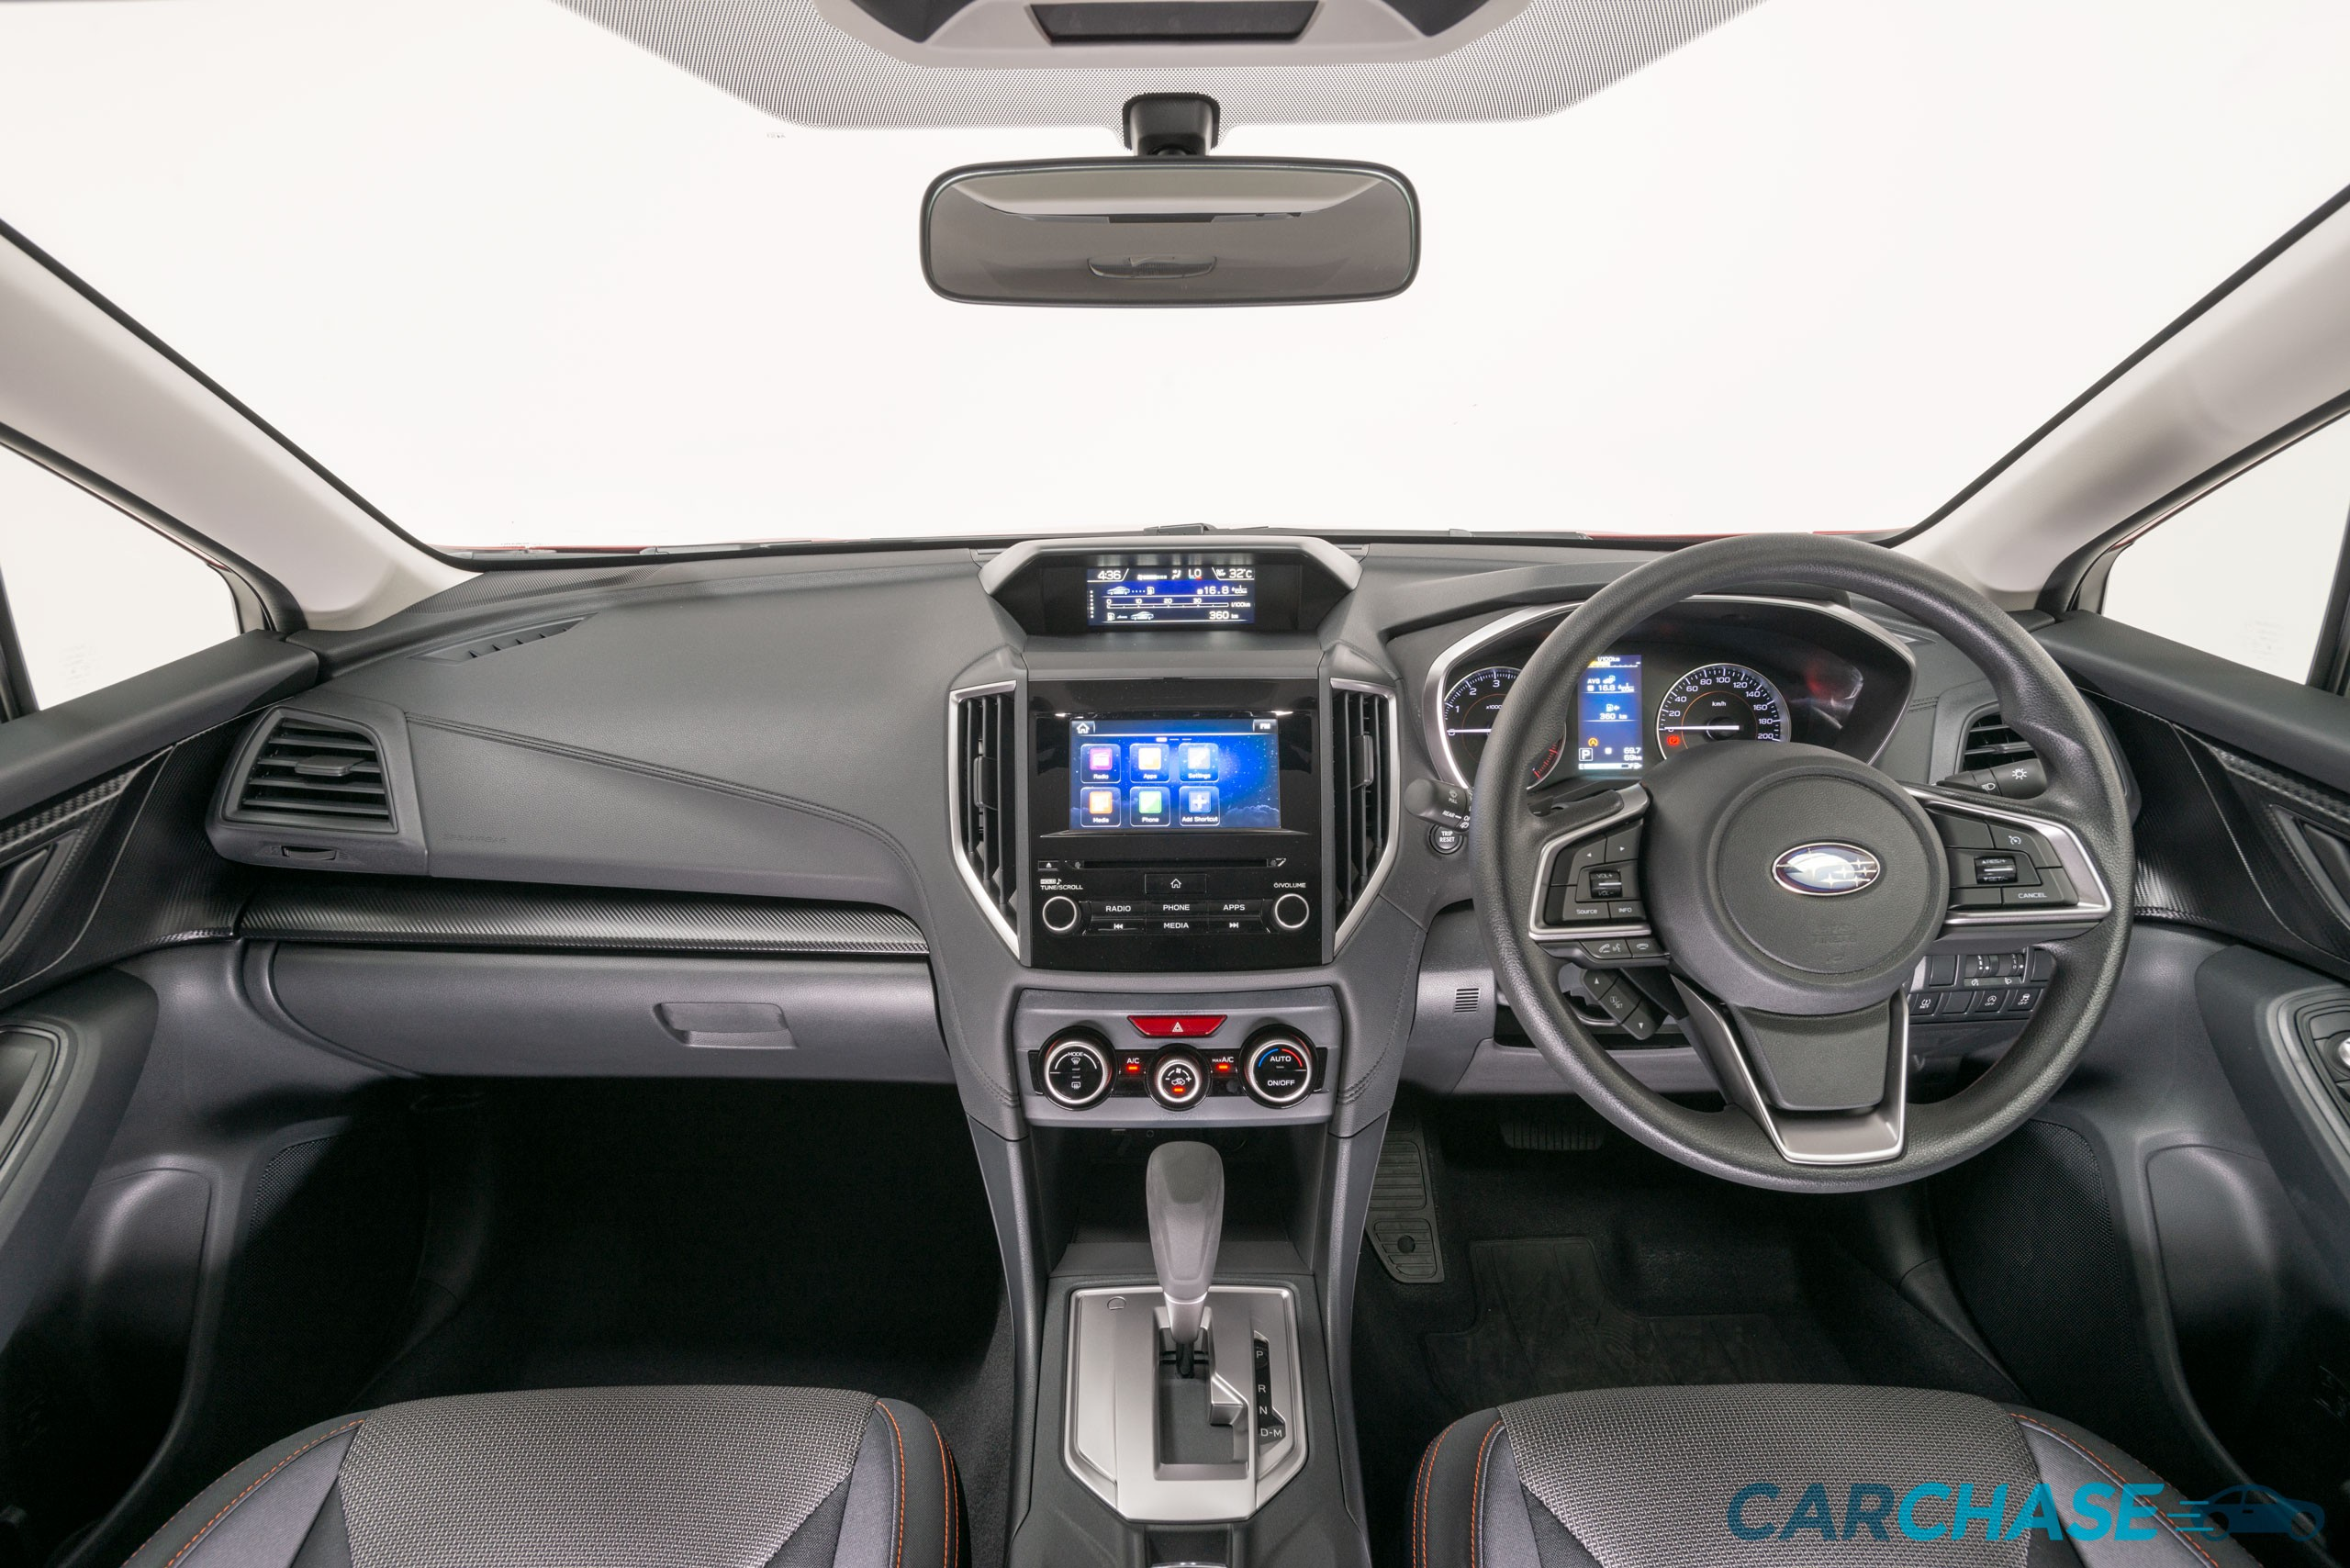 Image of dashboard profile of 2018 Subaru XV 2.0i